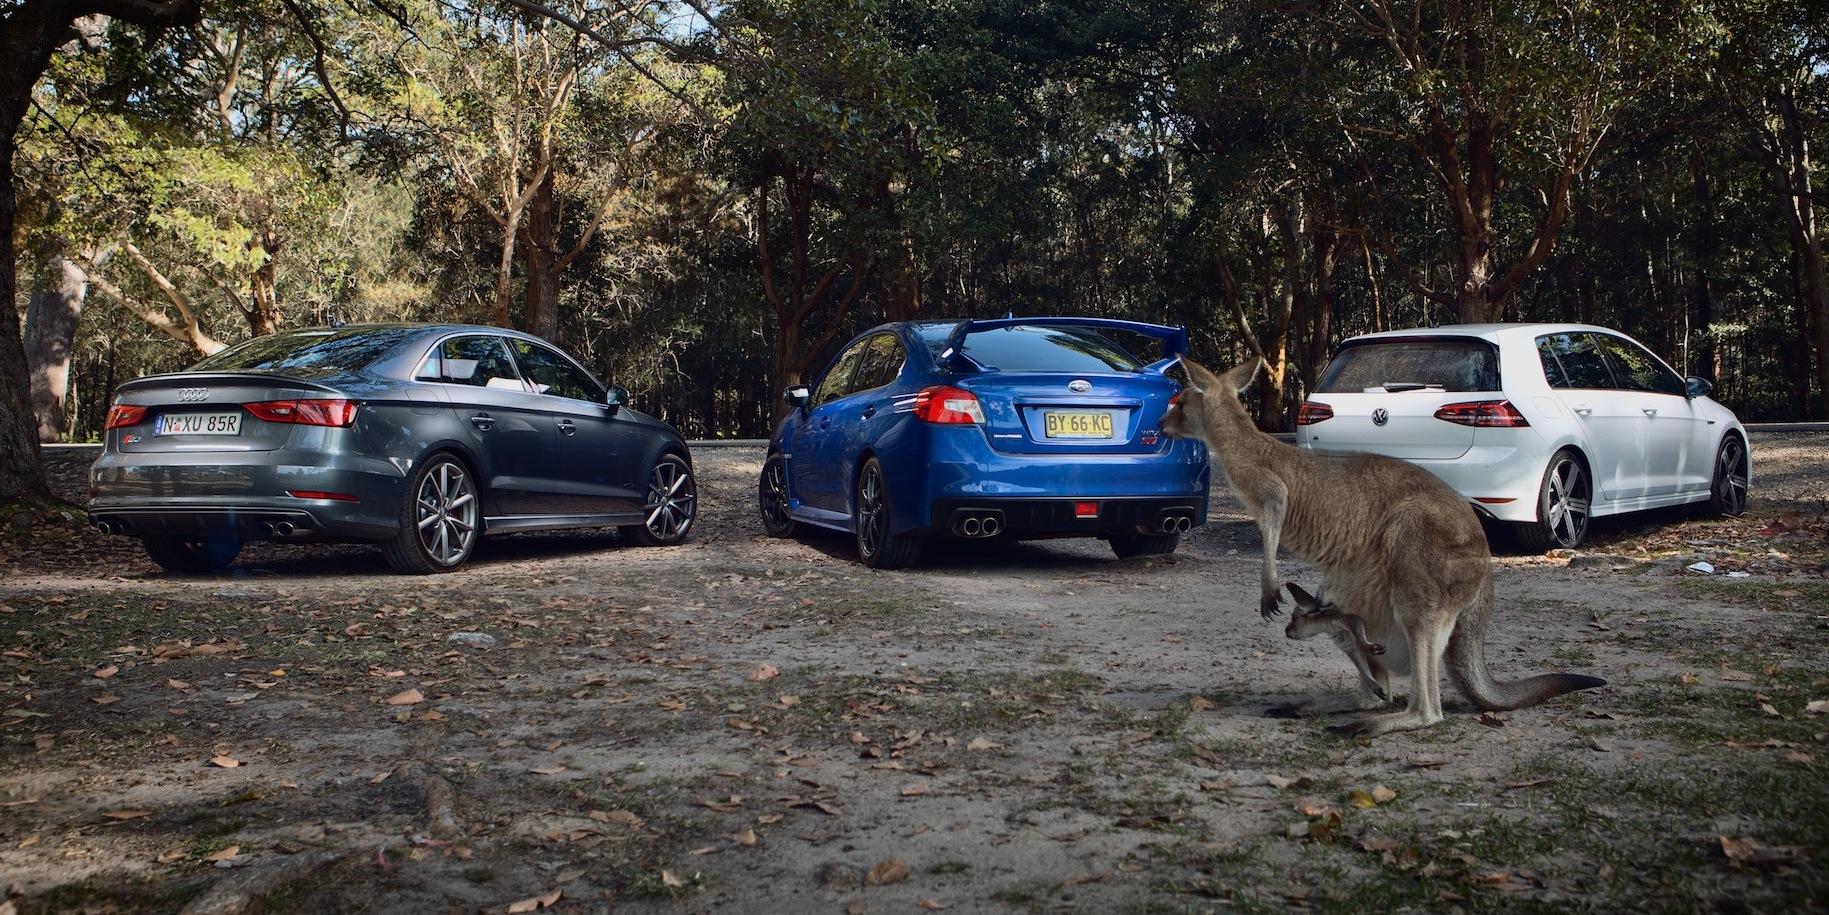 Sports Car Comparison Subaru WRX STI V Audi S V Volkswagen Golf - Sports car comparison